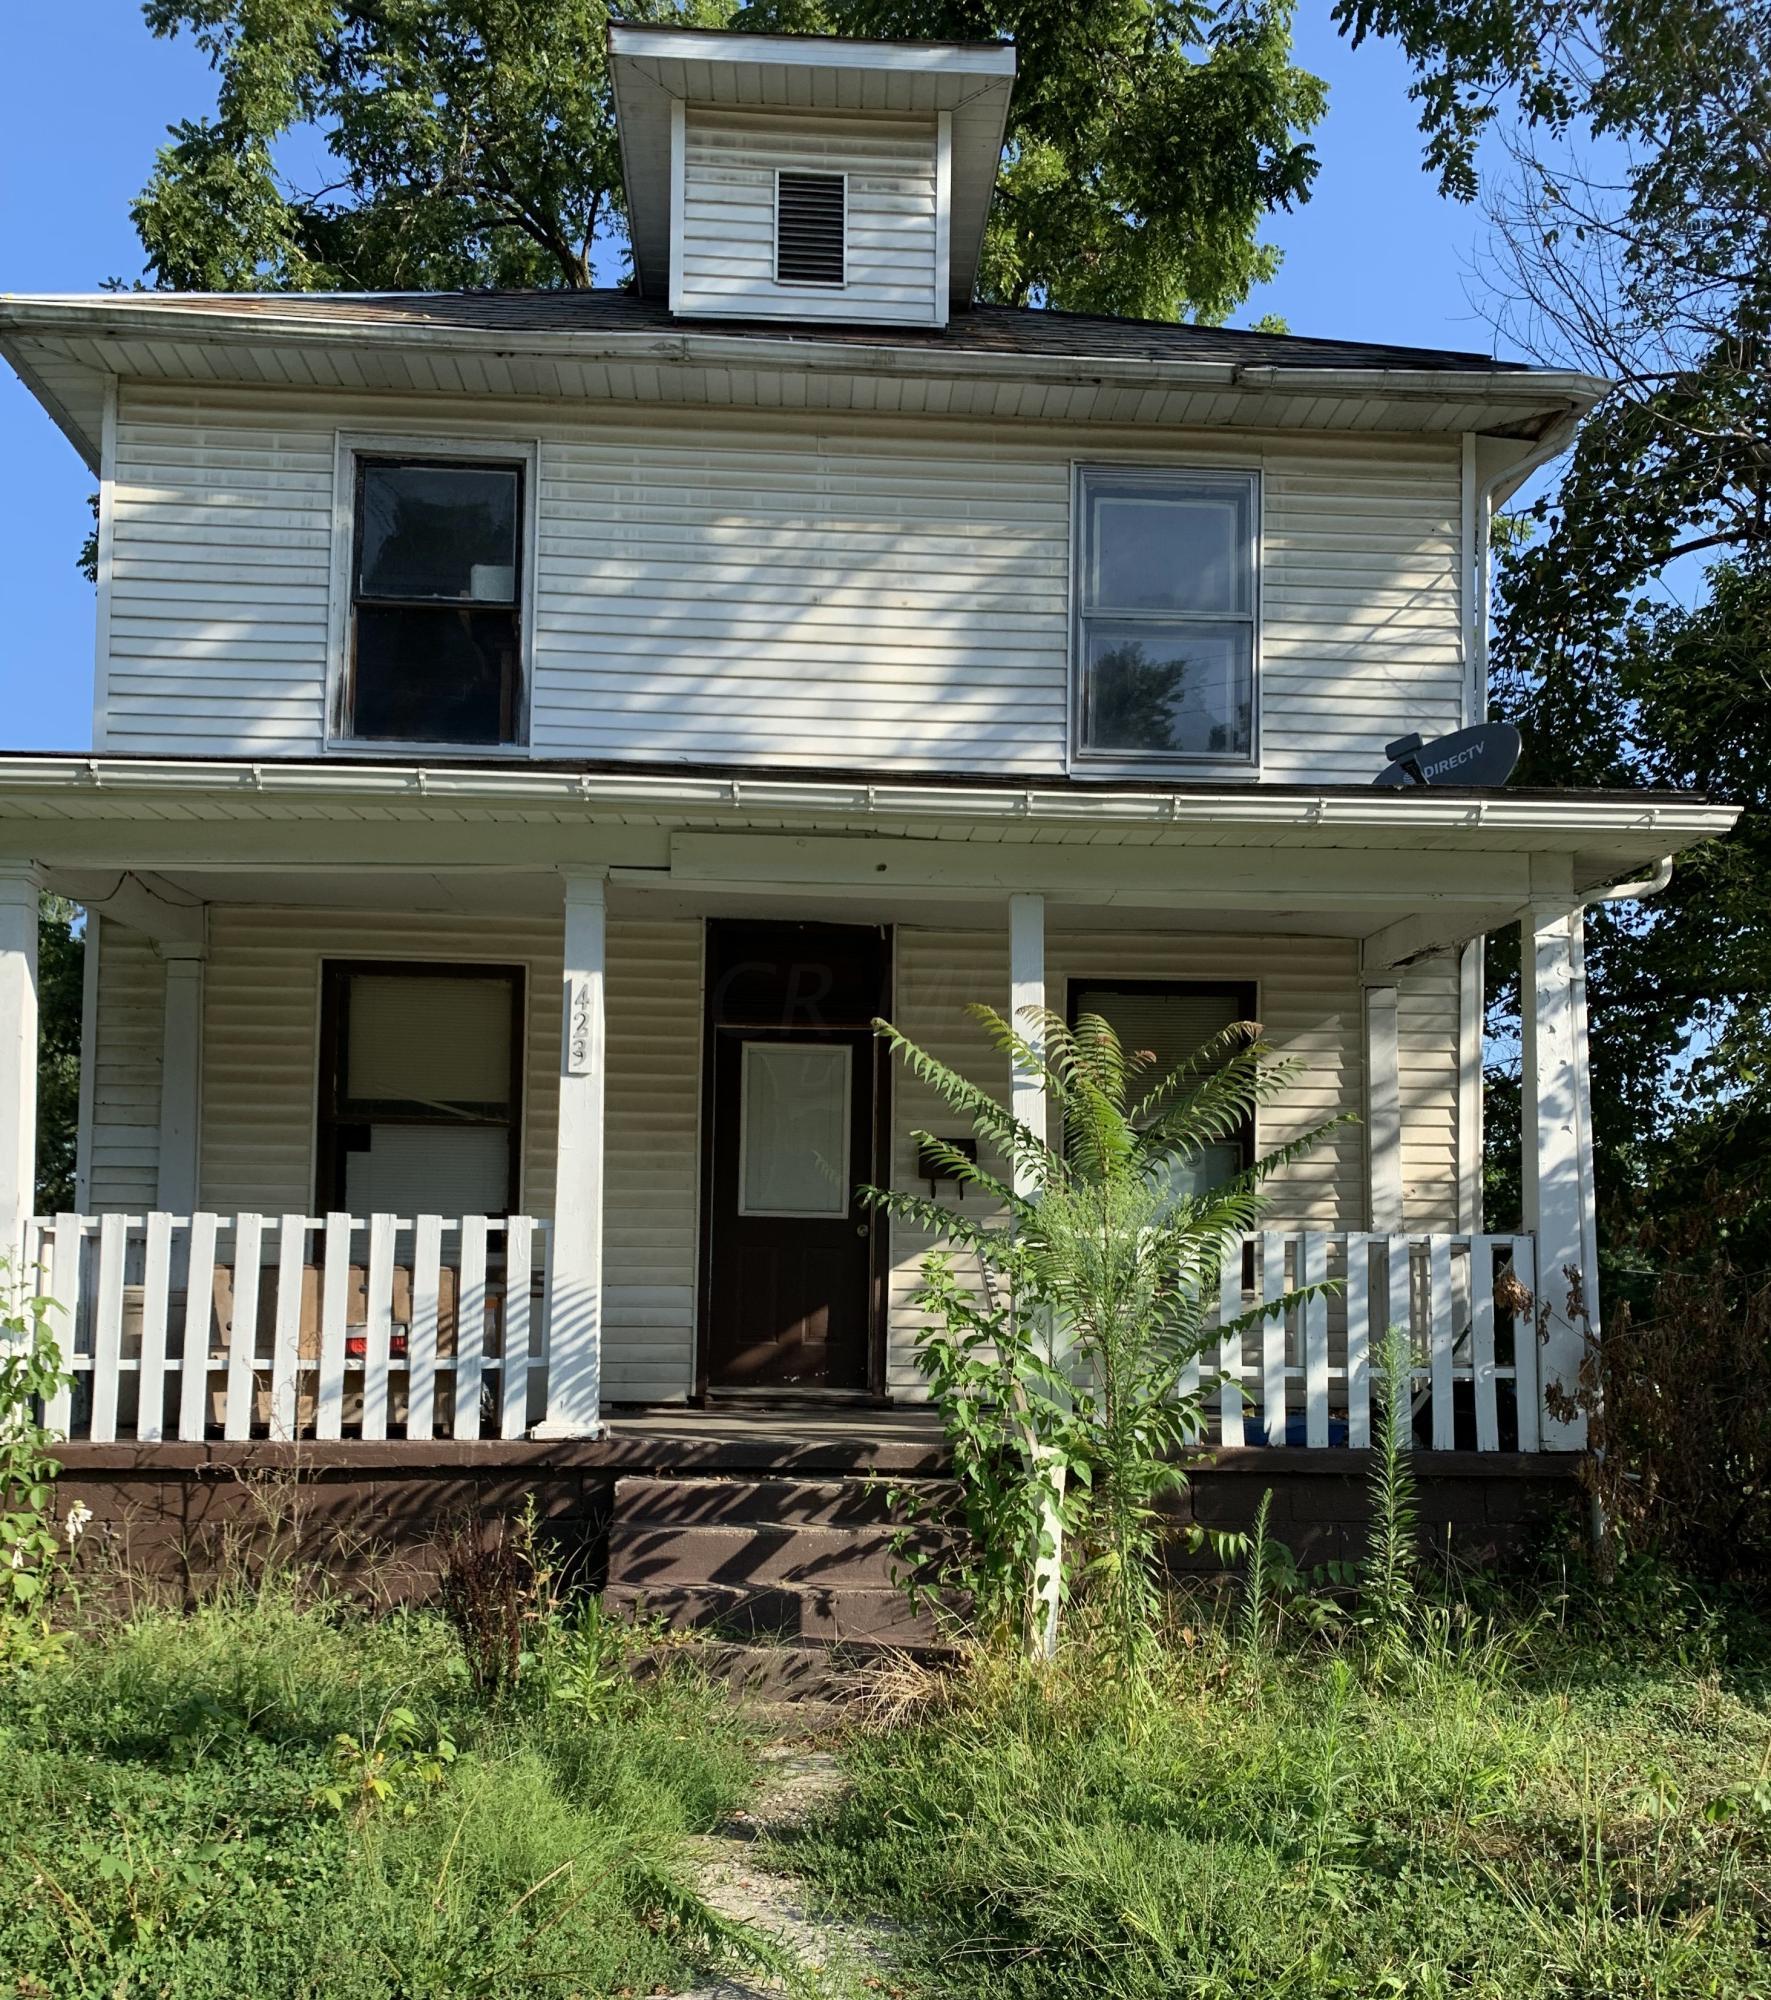 423 Dryden Road, Zanesville, Ohio 43701, 3 Bedrooms Bedrooms, ,1 BathroomBathrooms,Residential,For Sale,Dryden,220036664